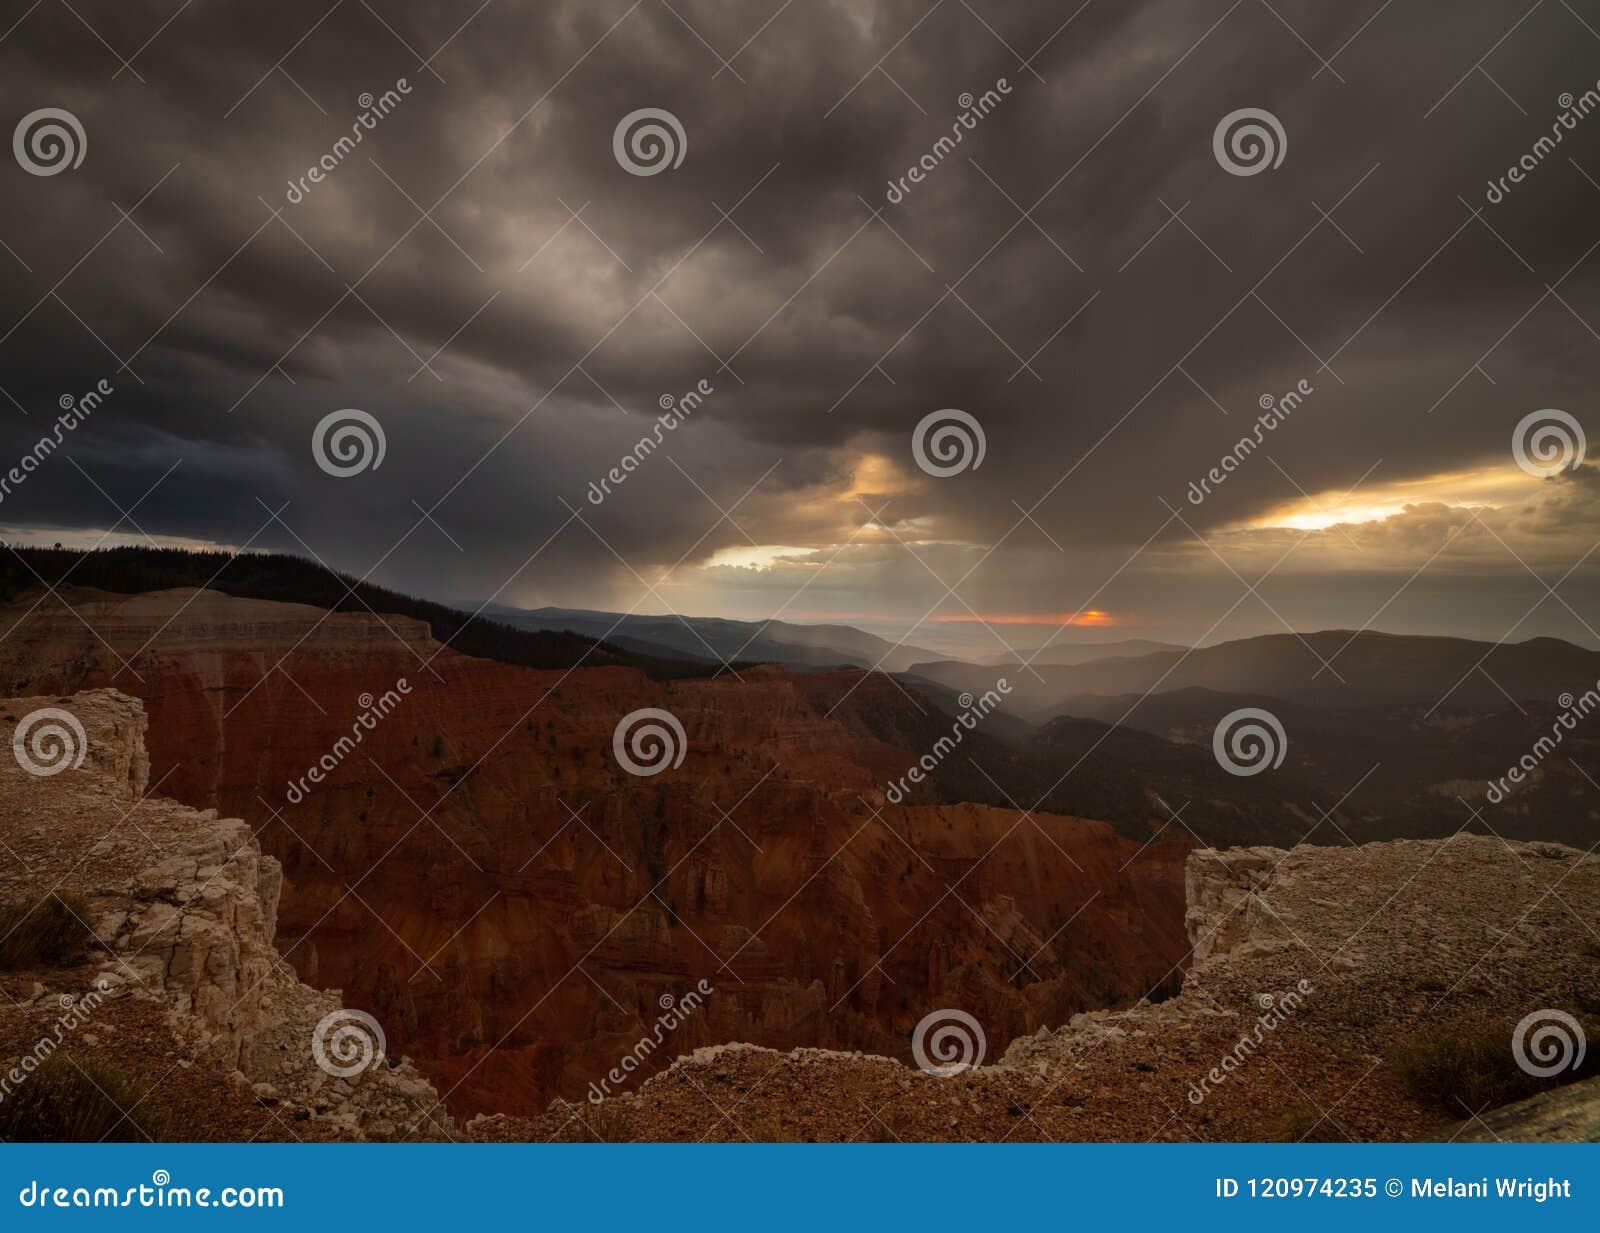 Cedar breaks amphitheater under dark stormy skies at sunset